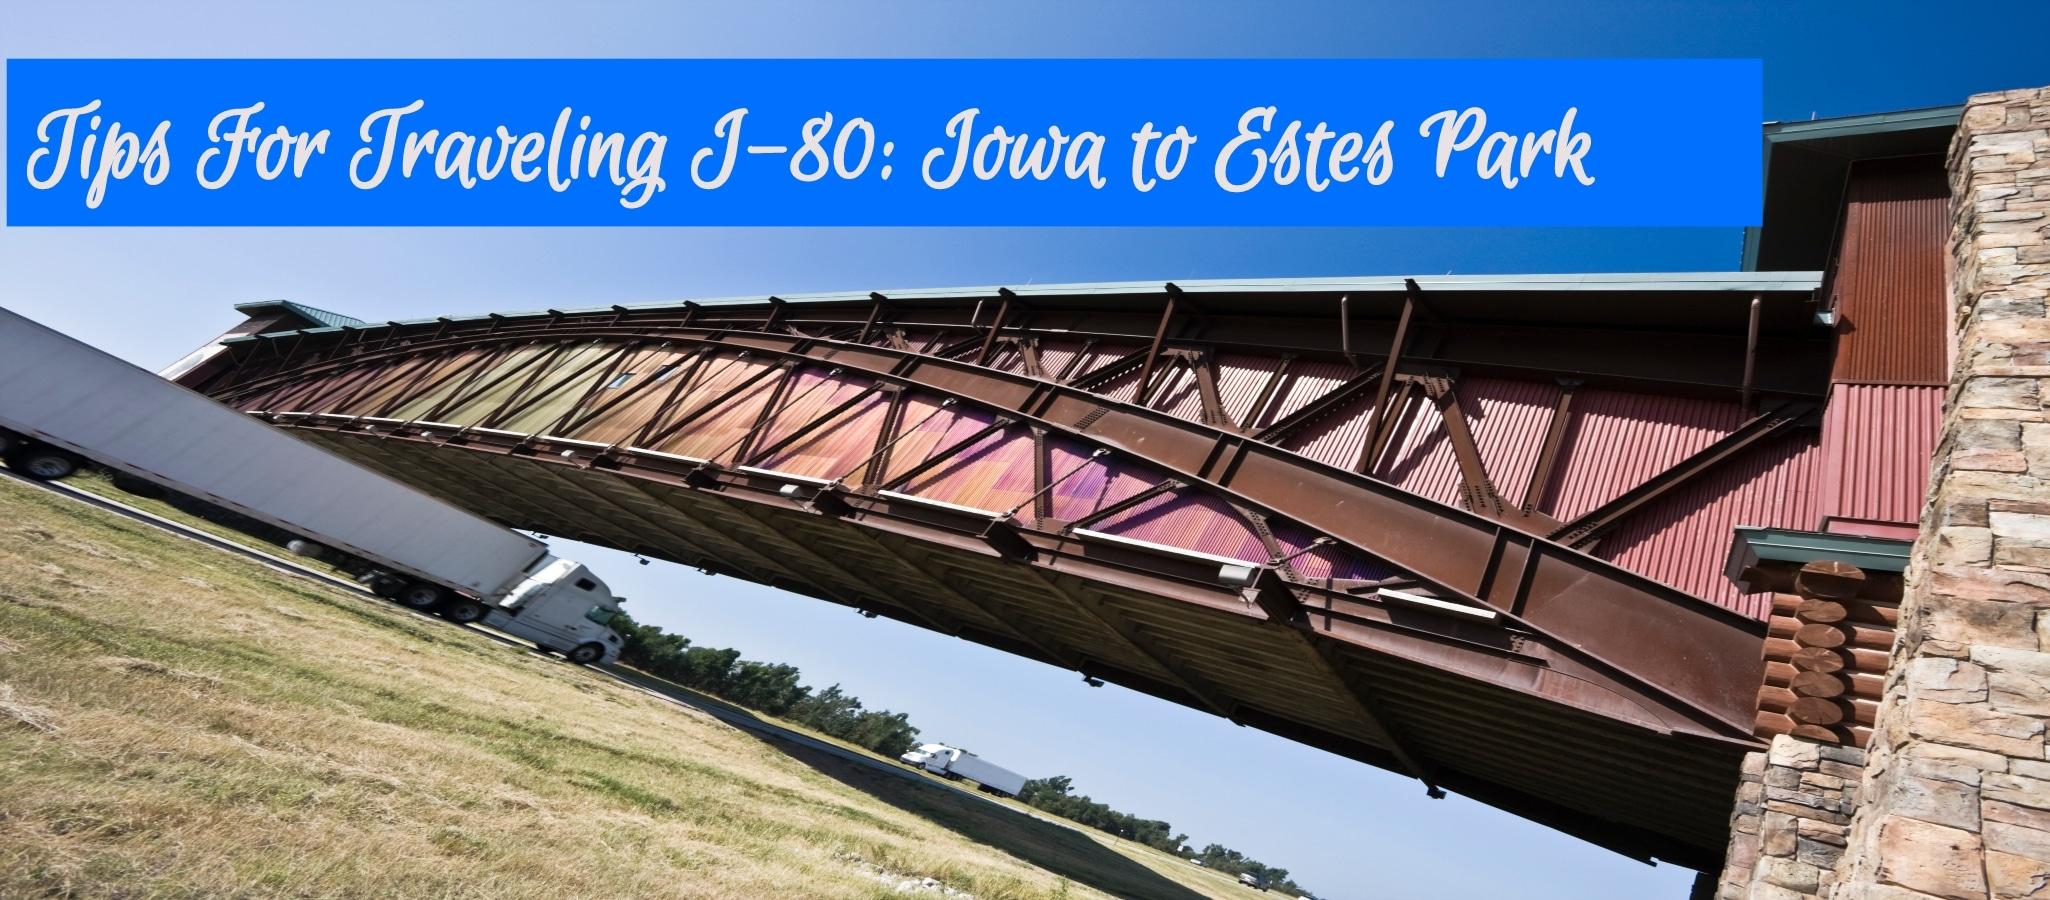 Iowa to Estes Park I 80